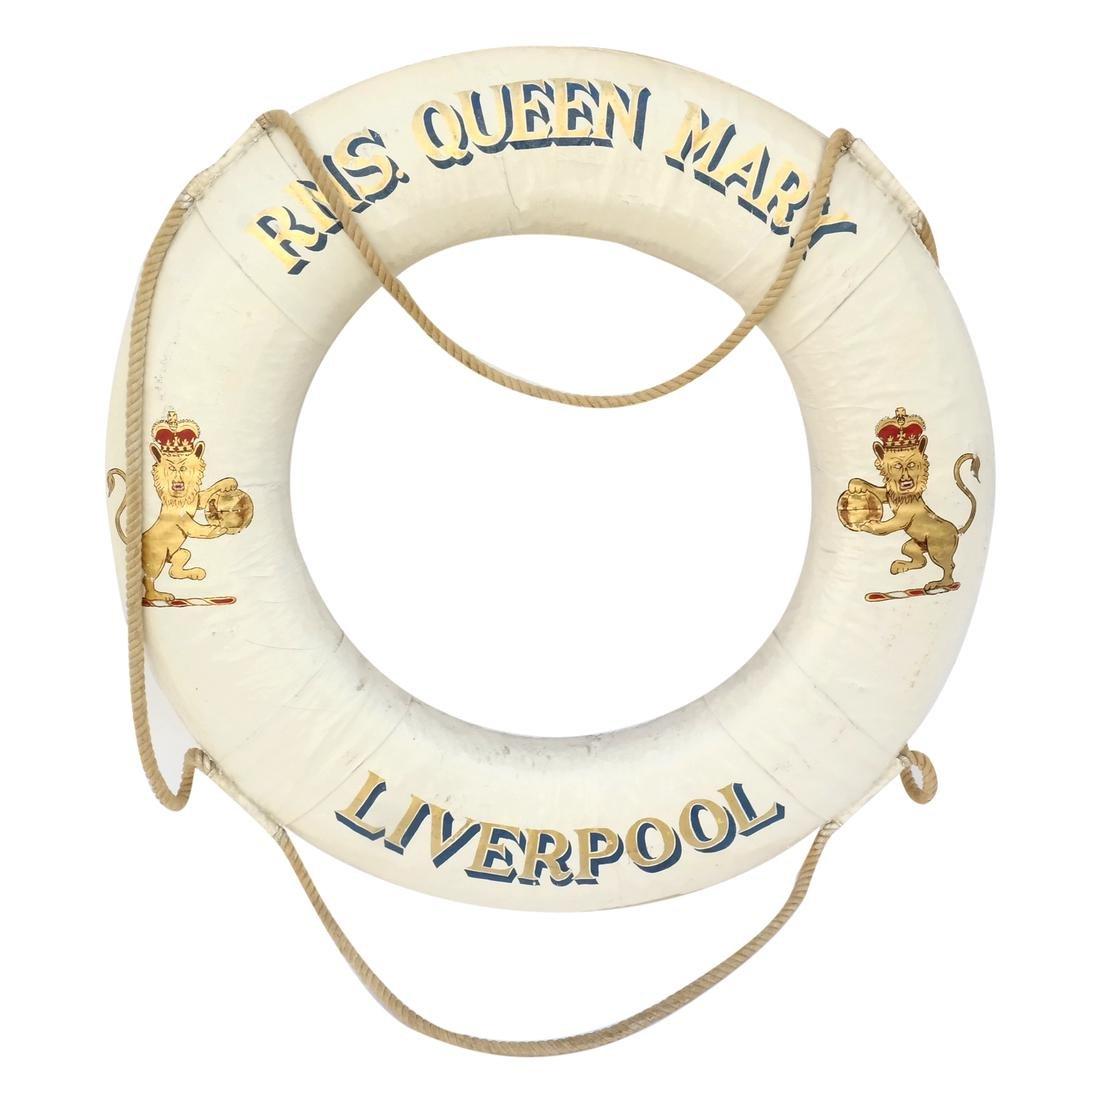 R.M.S. Queen Mary Original Ceremonial Life Ring